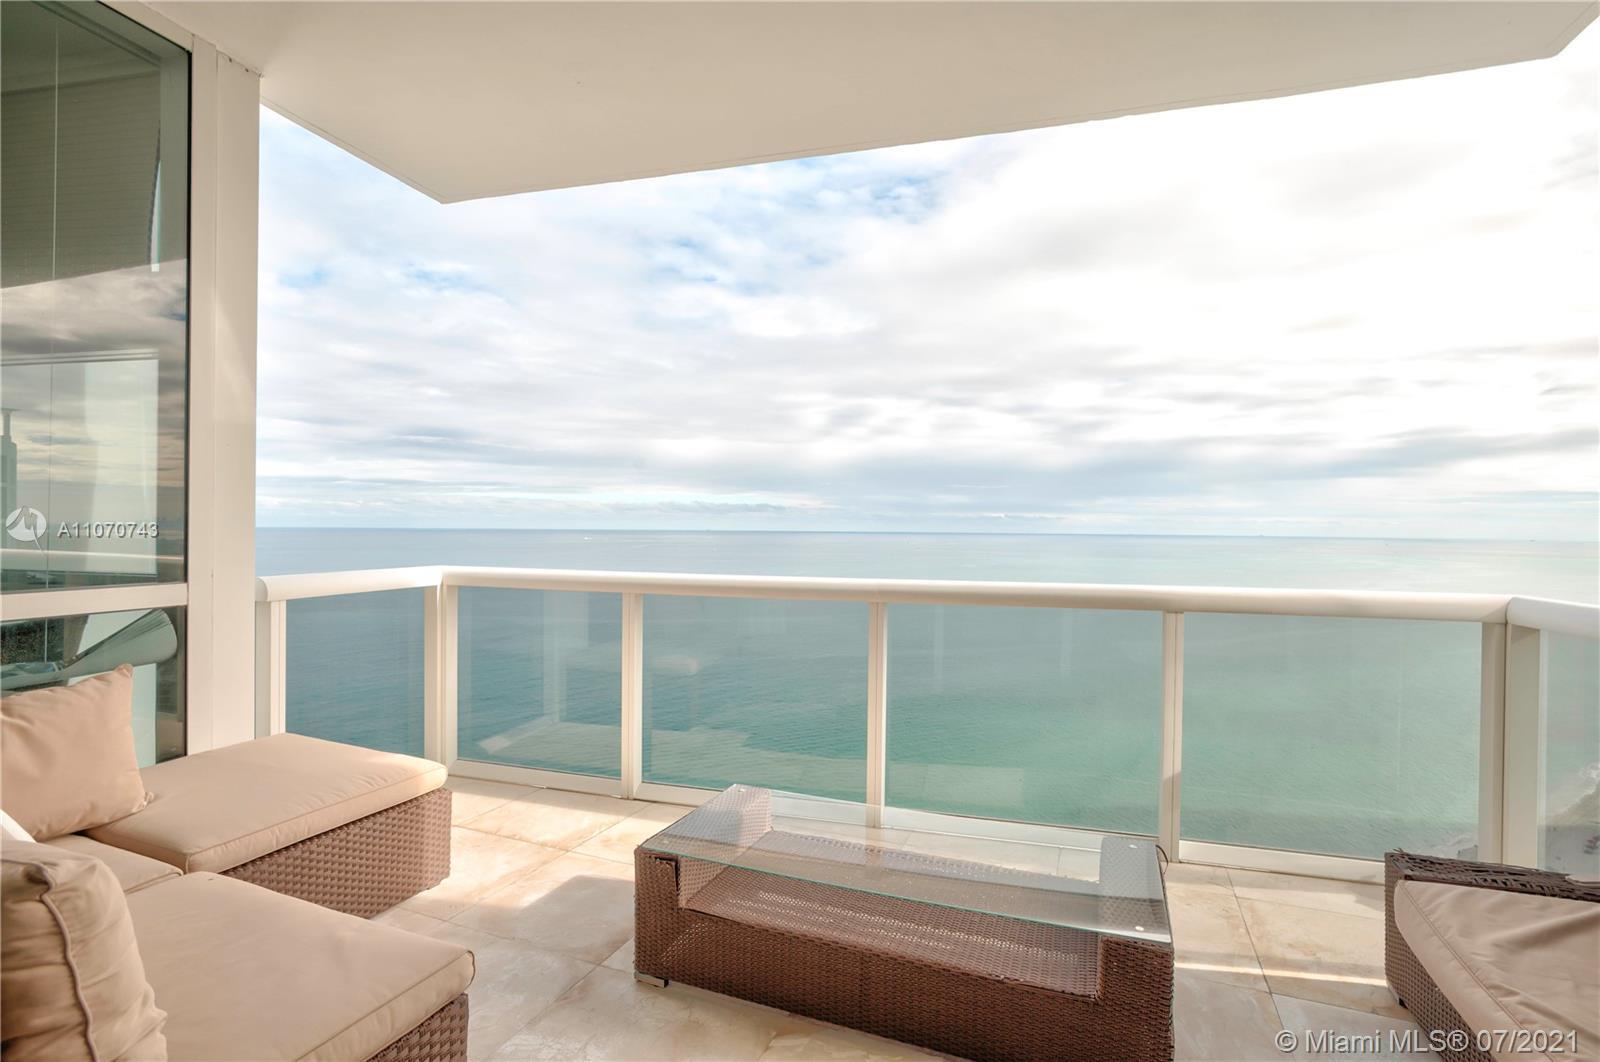 Beautiful oceanfront unit. 3 bedroom 3.5 bath in Trump Palace amazing beach club, 4 pools, tennis co